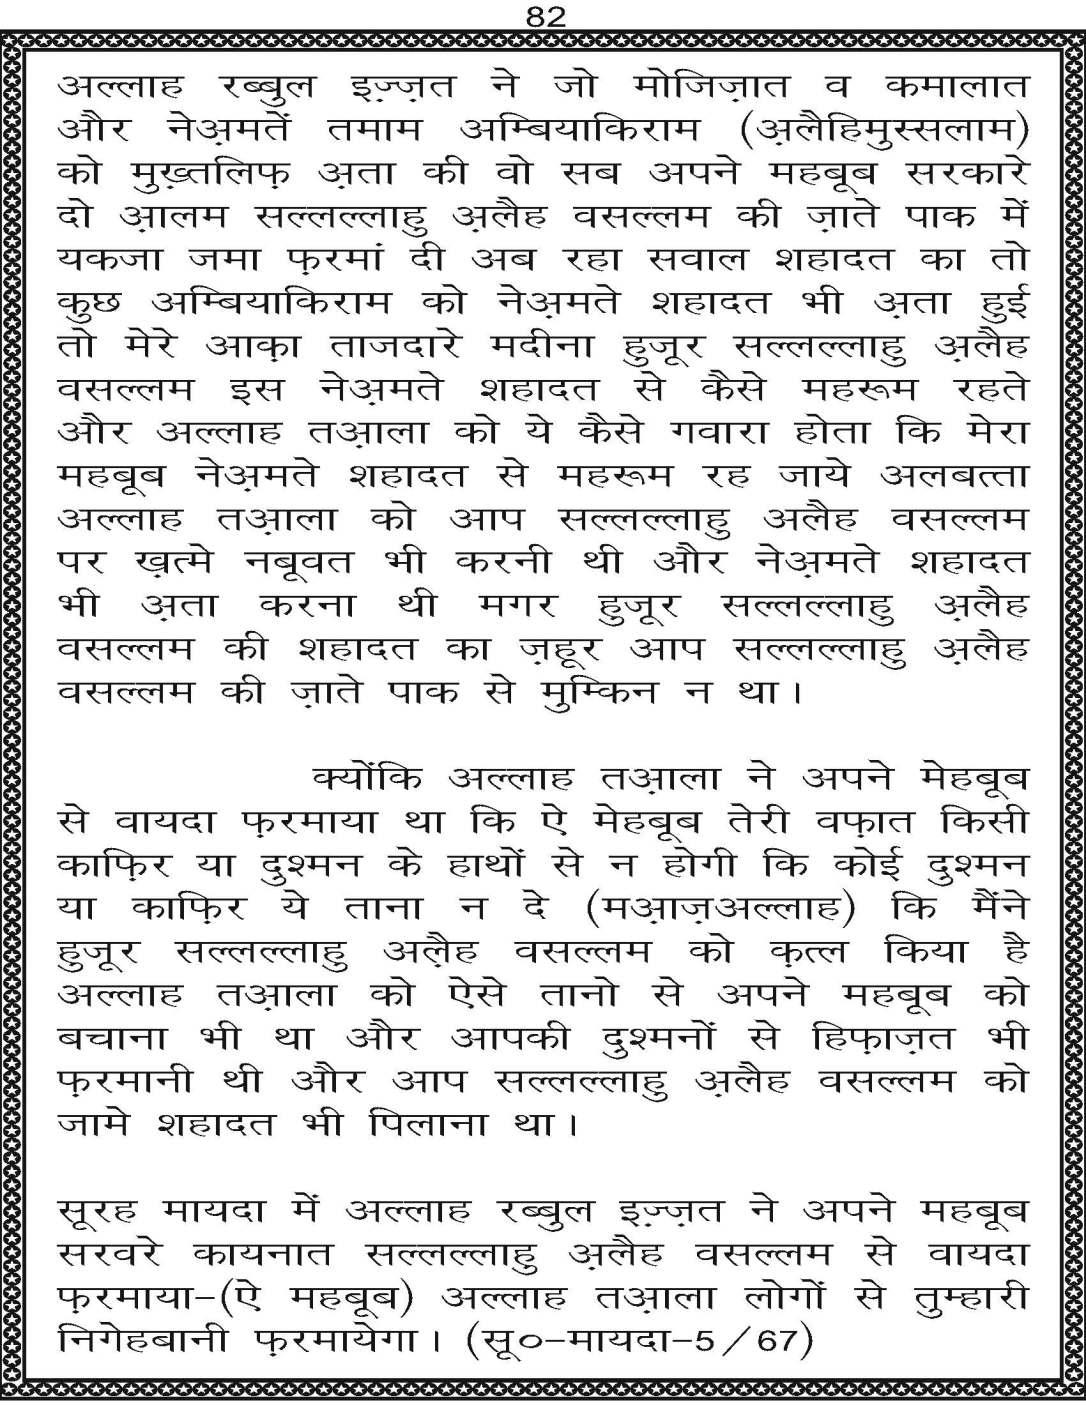 AzmateTaziyadari_Page_082